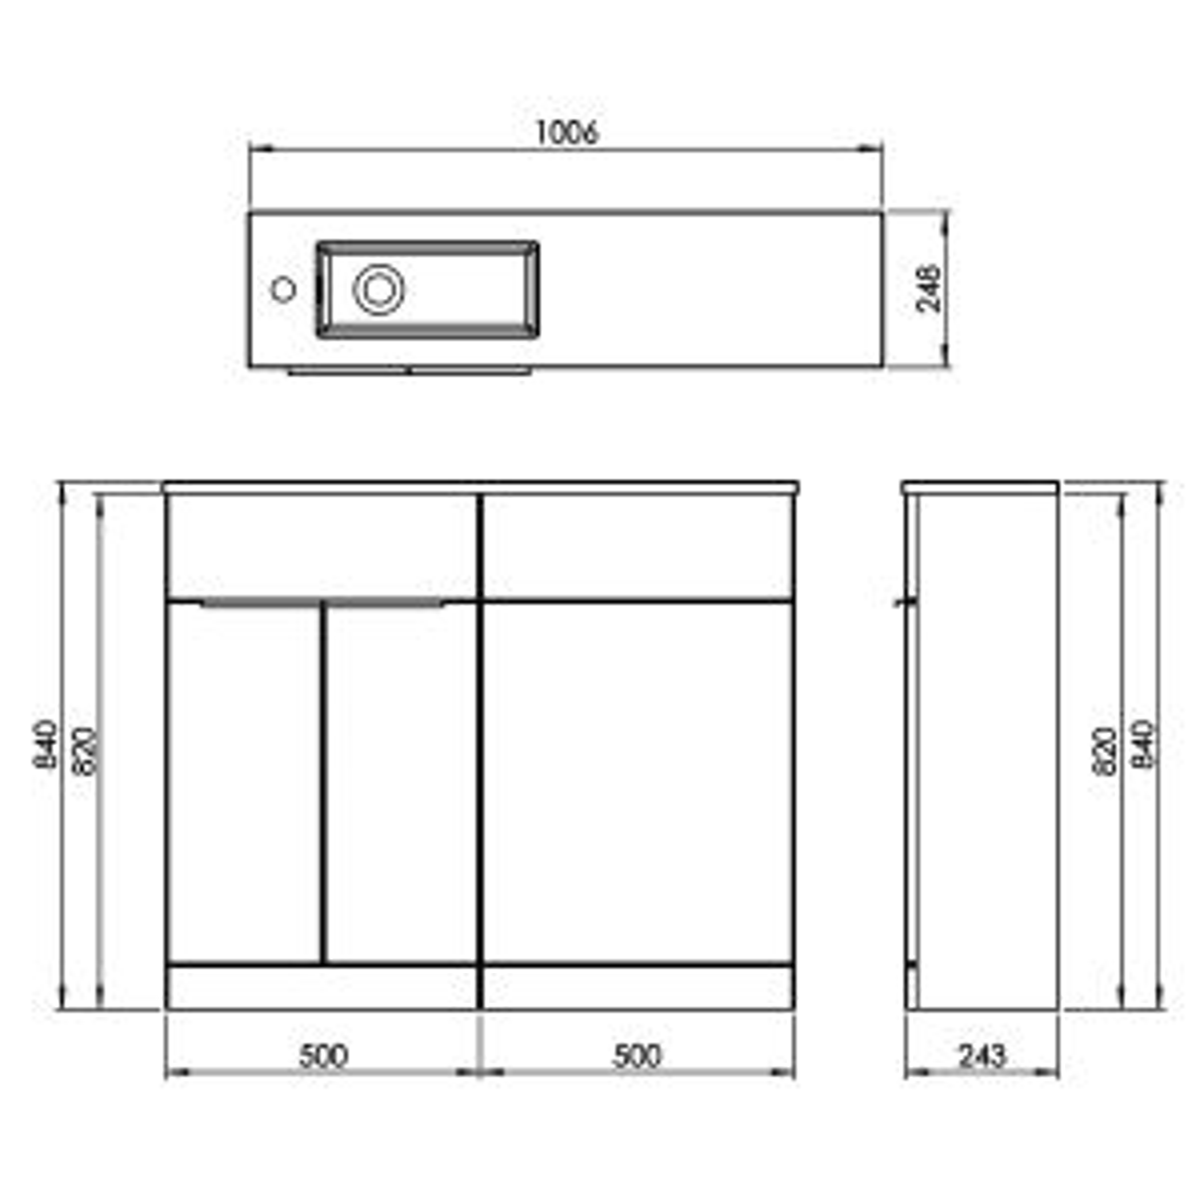 Elation Combination Straight Pearl Grey Matt Furniture Pack Dimensions